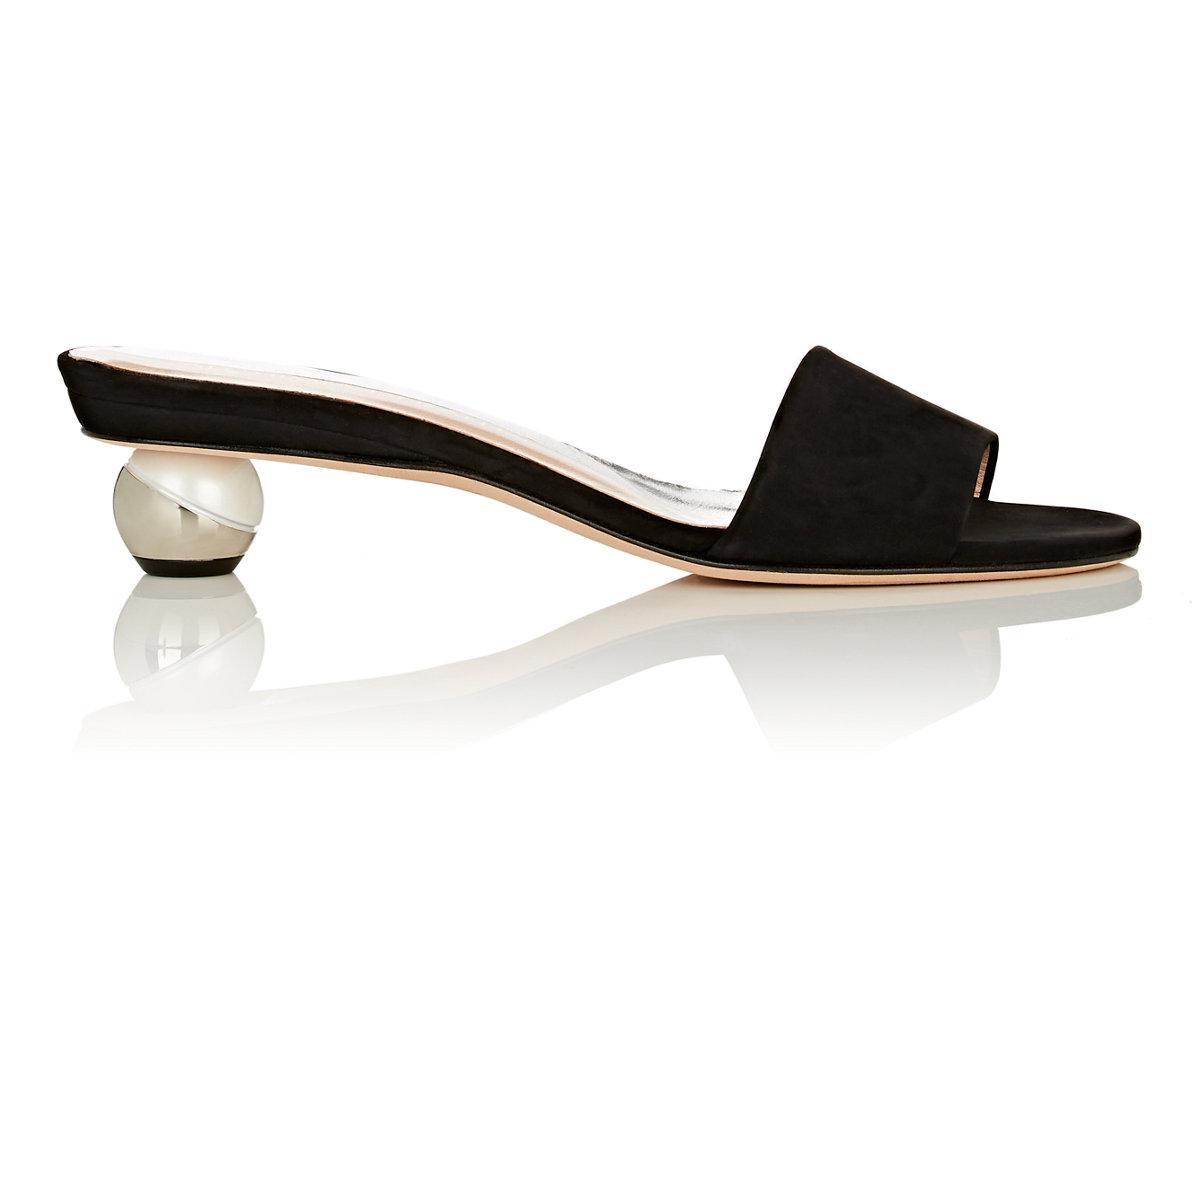 outlet cost ALCHIMIA DI BALLIN Anaxa Suede Sandals discount for sale discount big sale clearance shop hBtcEIHcI